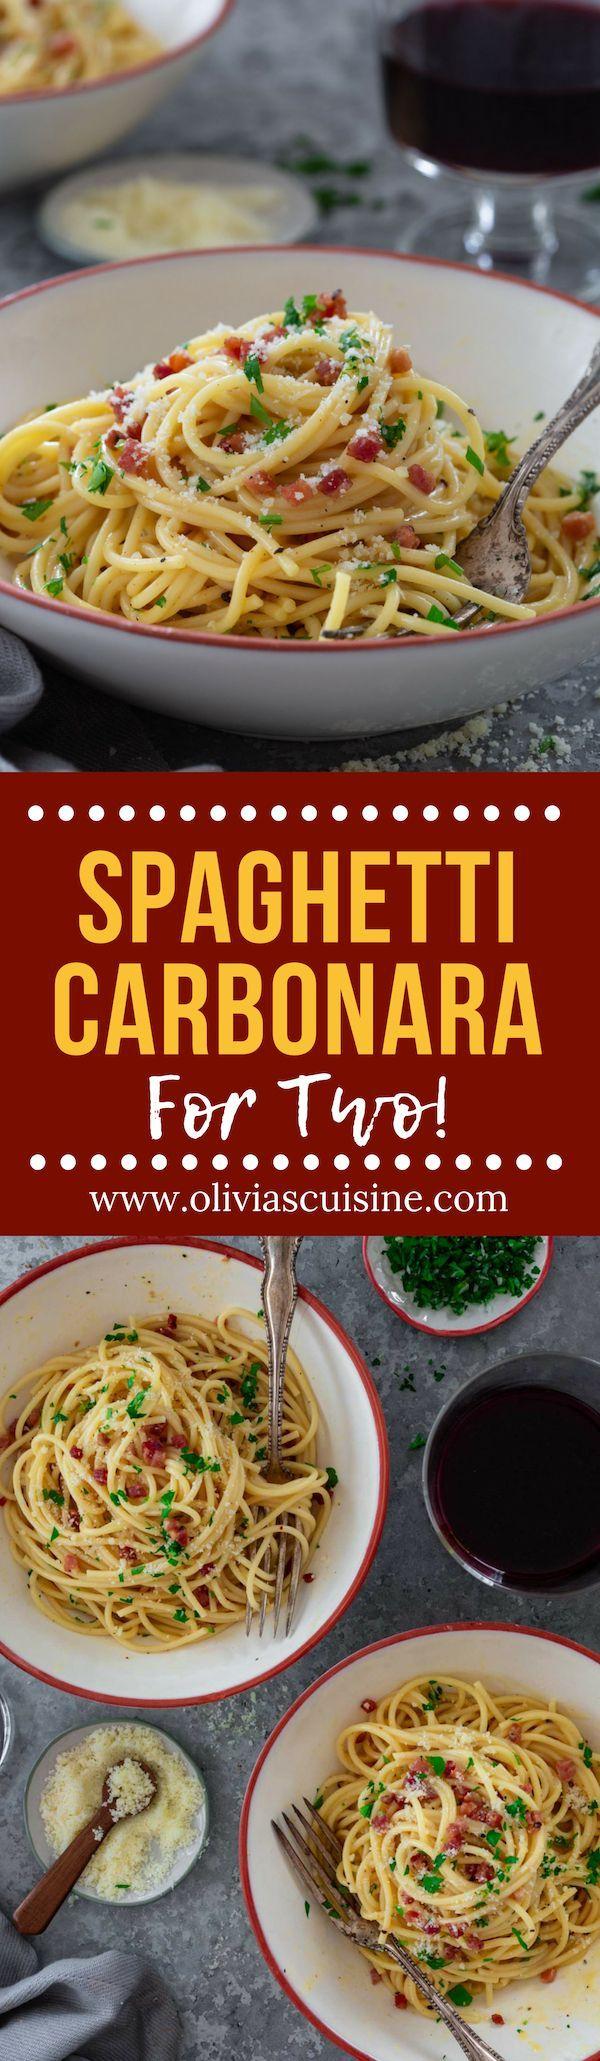 Spaghetti Alla Carbonara For Two Www Oliviascuisine Com Italian Spaghetti Alla Carbonara Is A Beef Recipes For Dinner Pasta Dishes Pasta Dinner Recipes